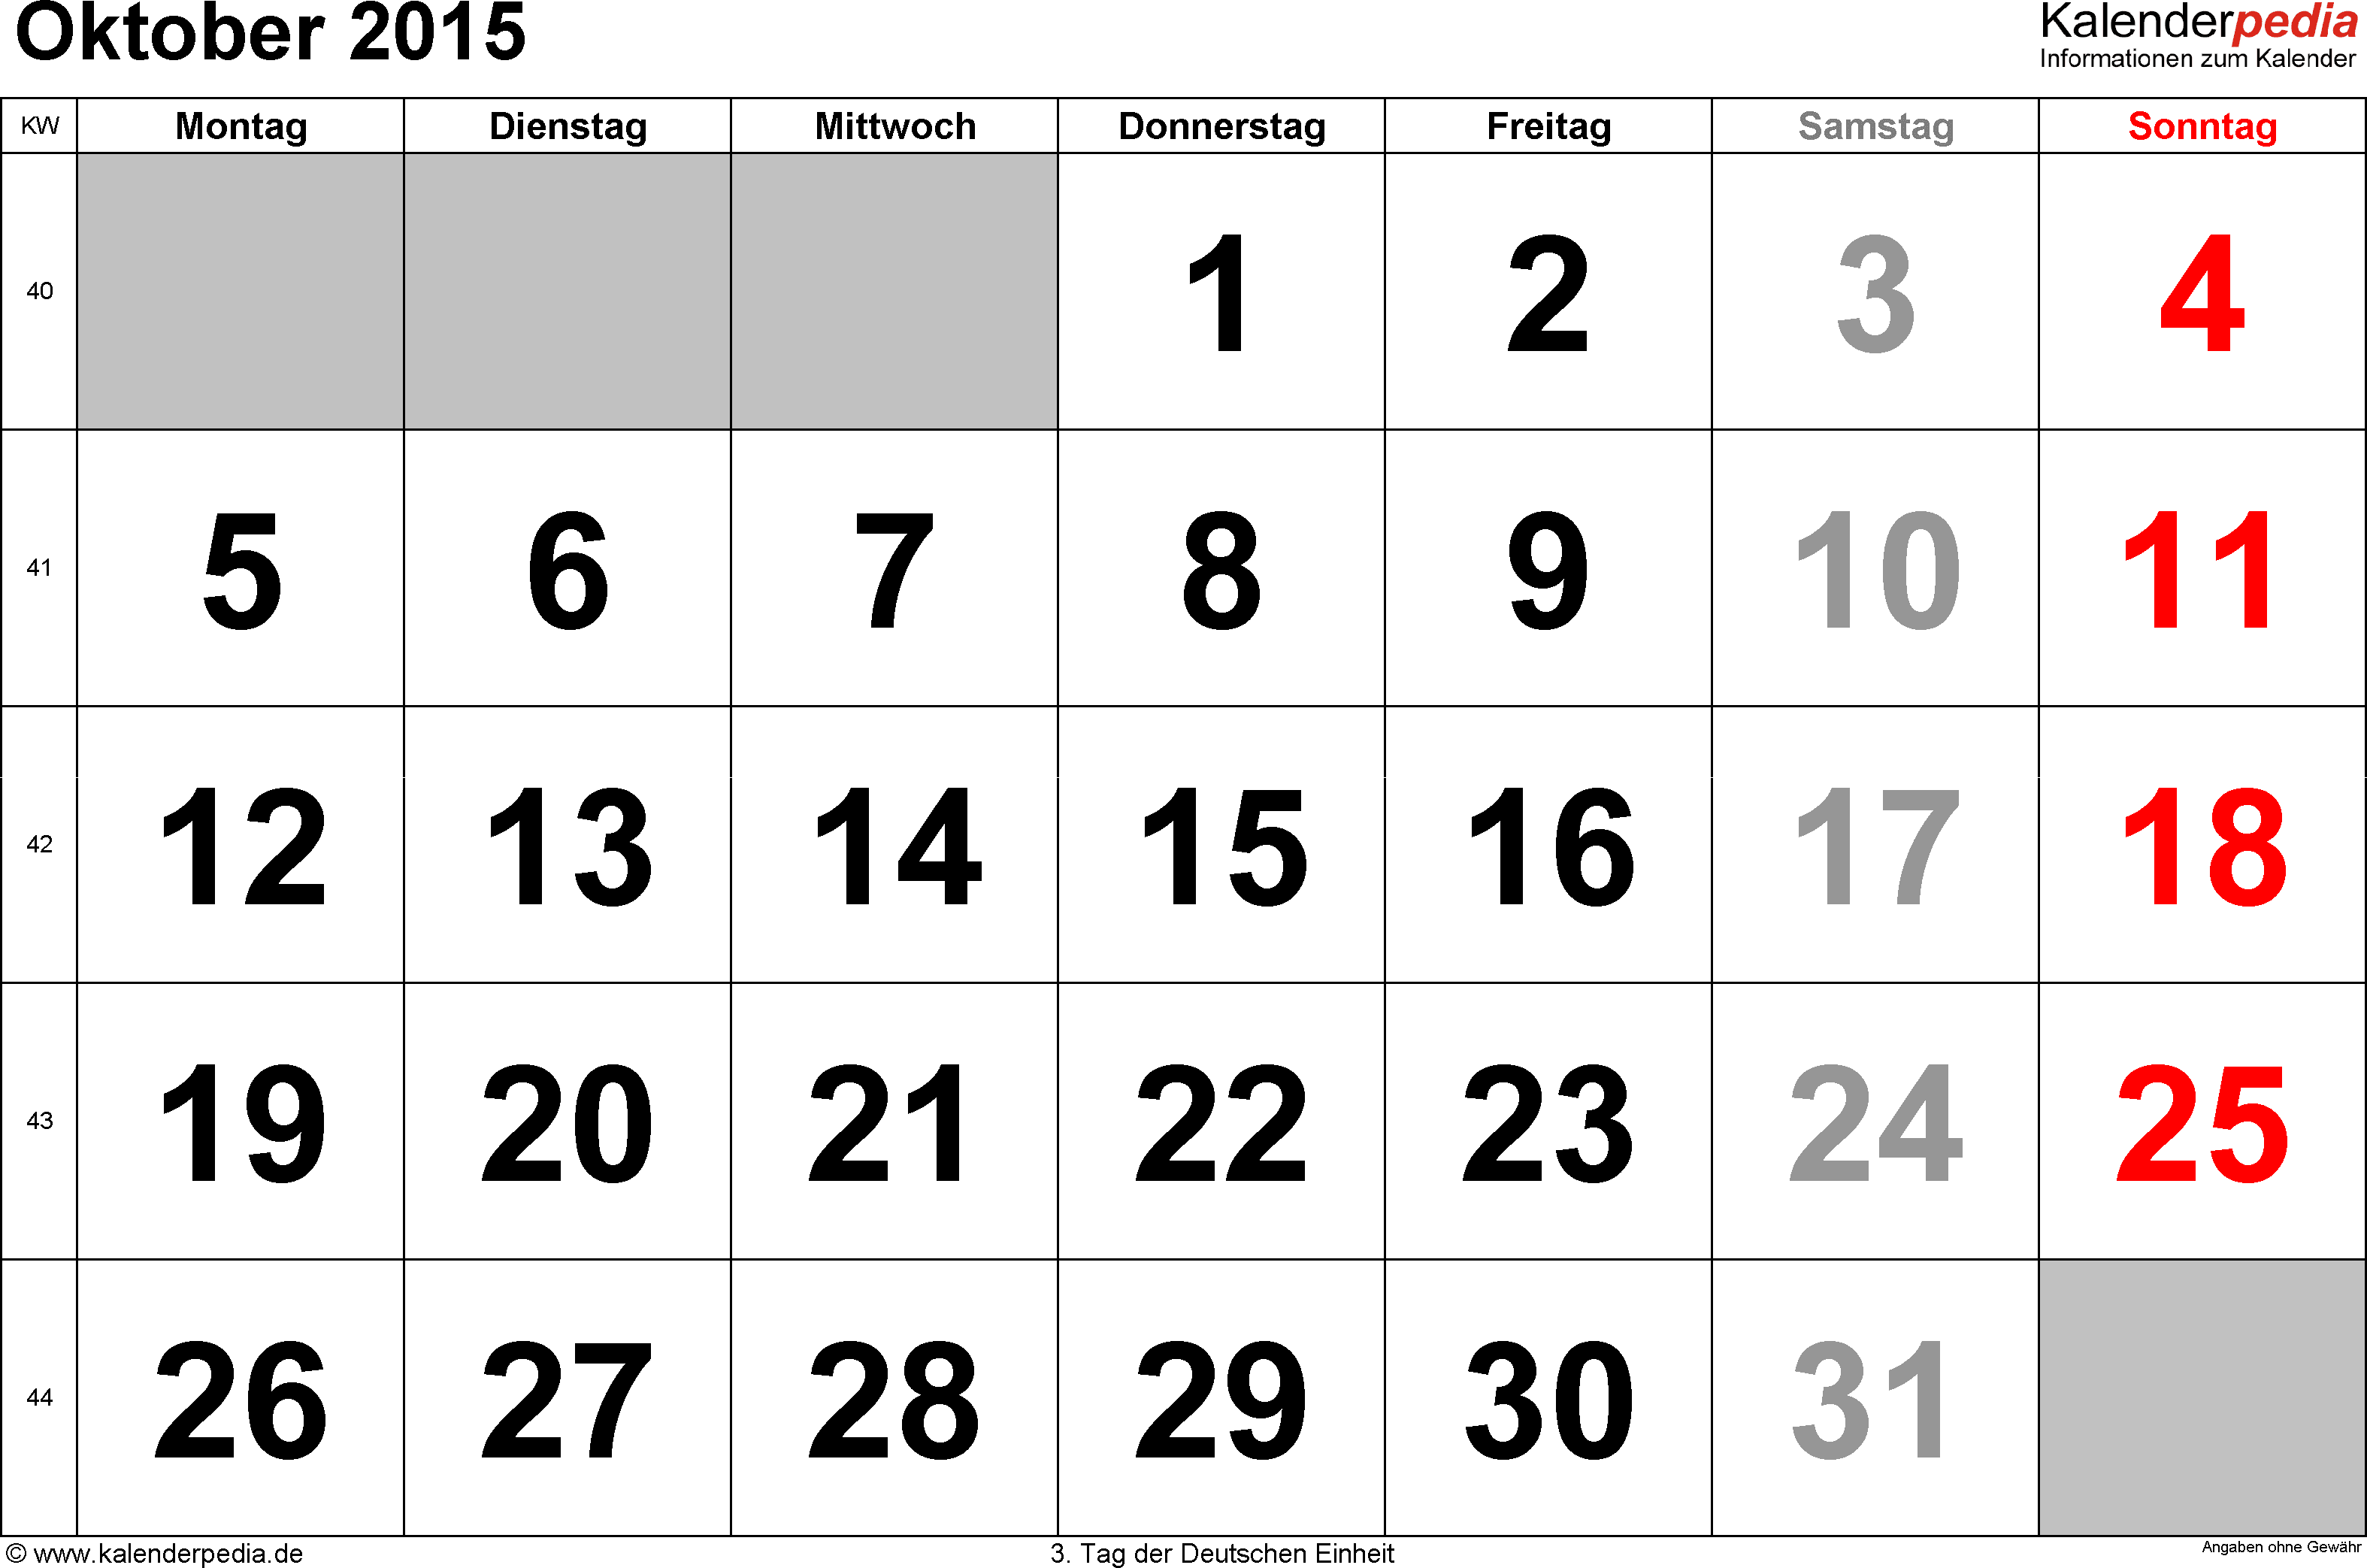 Kalender Oktober 2015 Als Excel Vorlagen